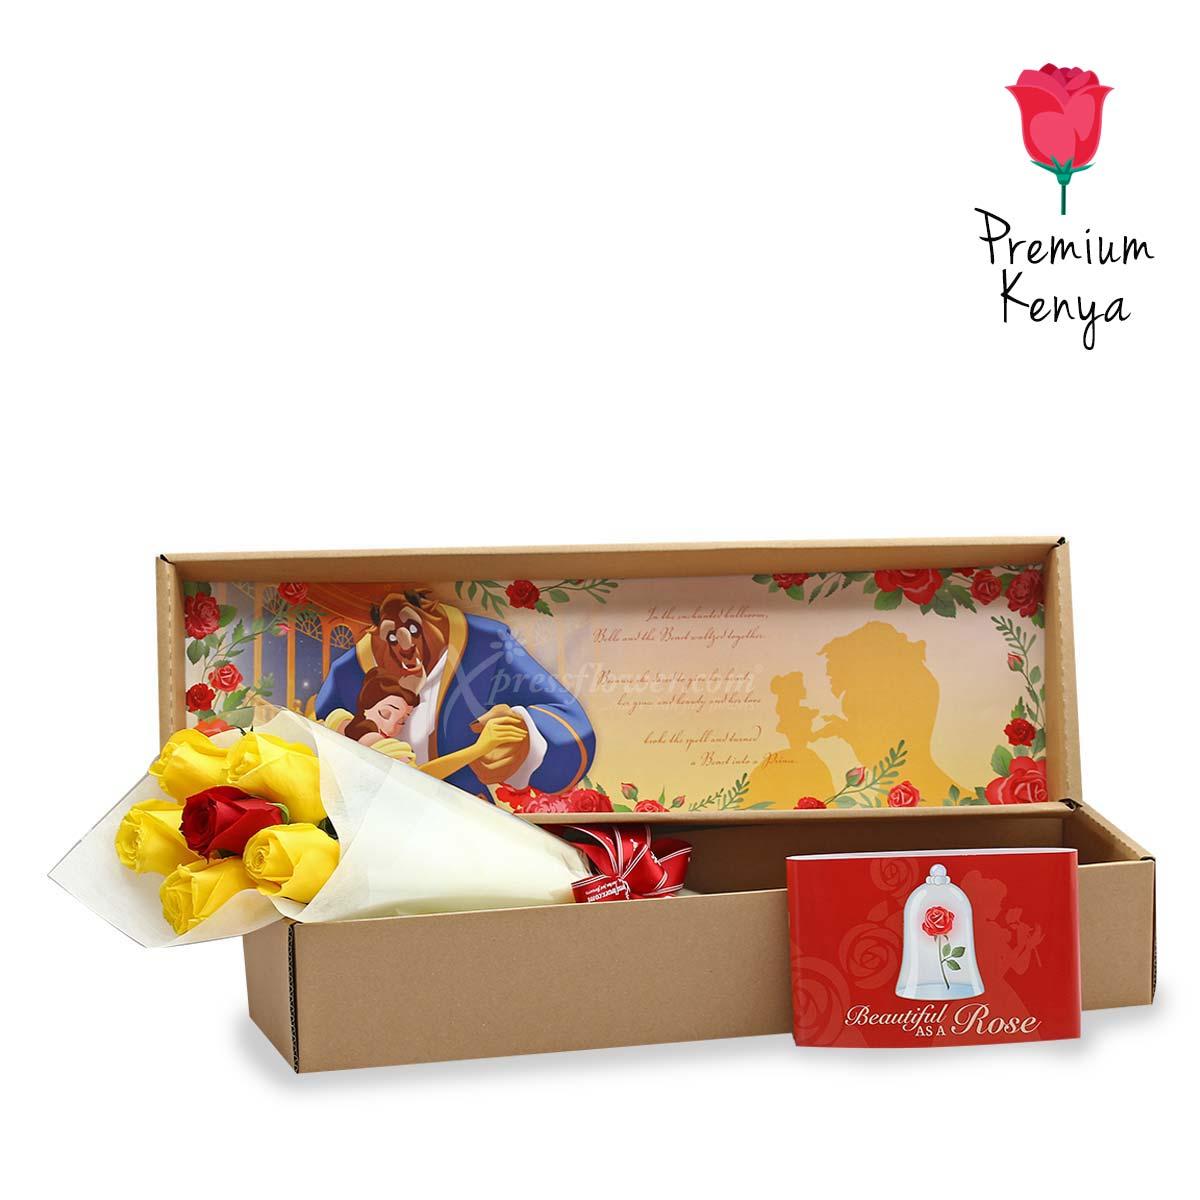 DSBX1903 Forbidden Amour Disney Box